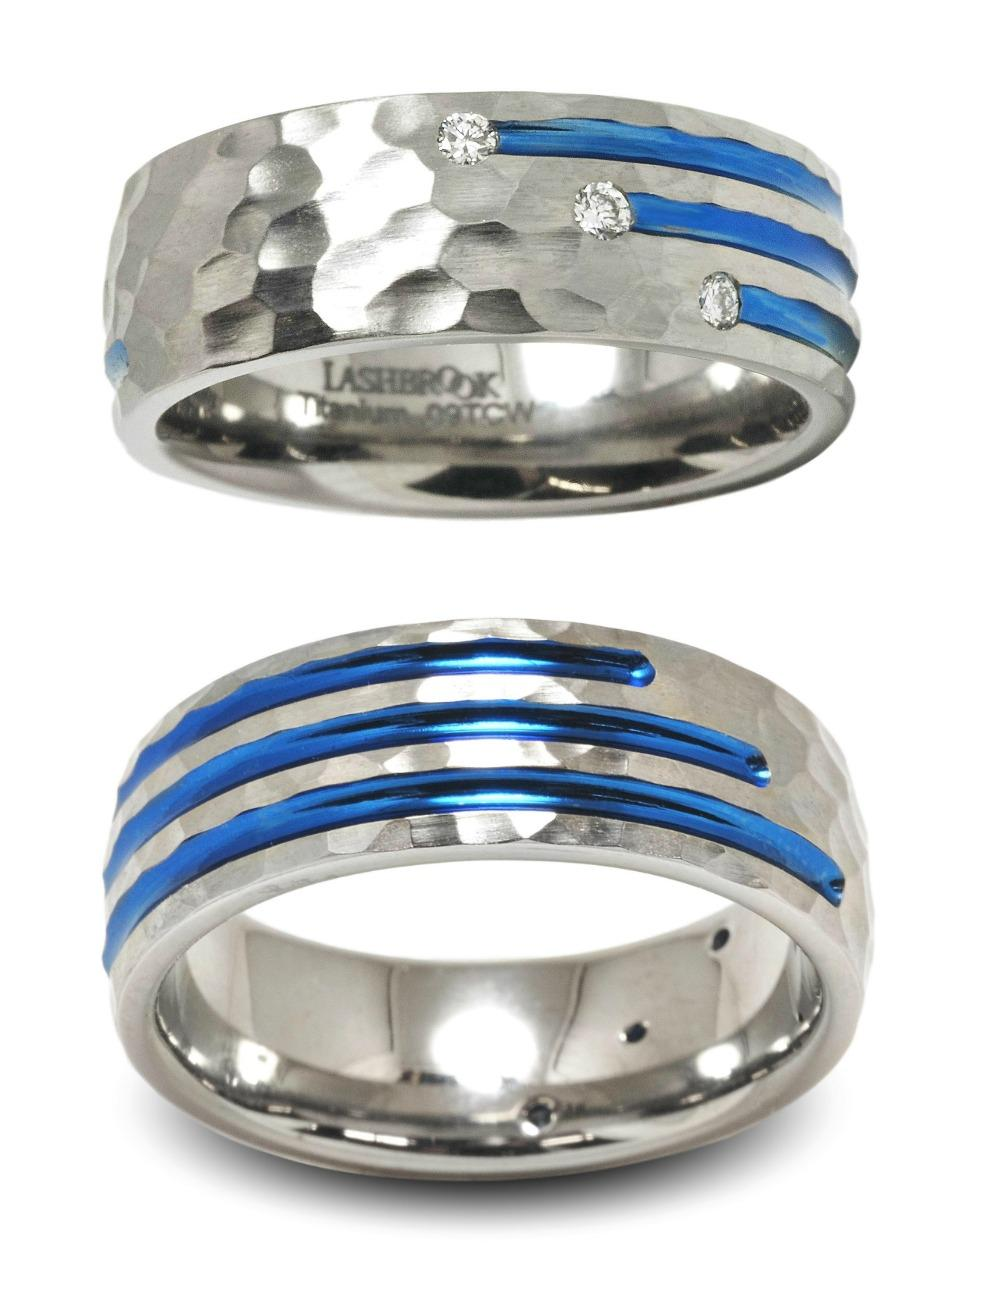 Anodized Titanium and Diamond Wedding Band from Lashbrook Designs